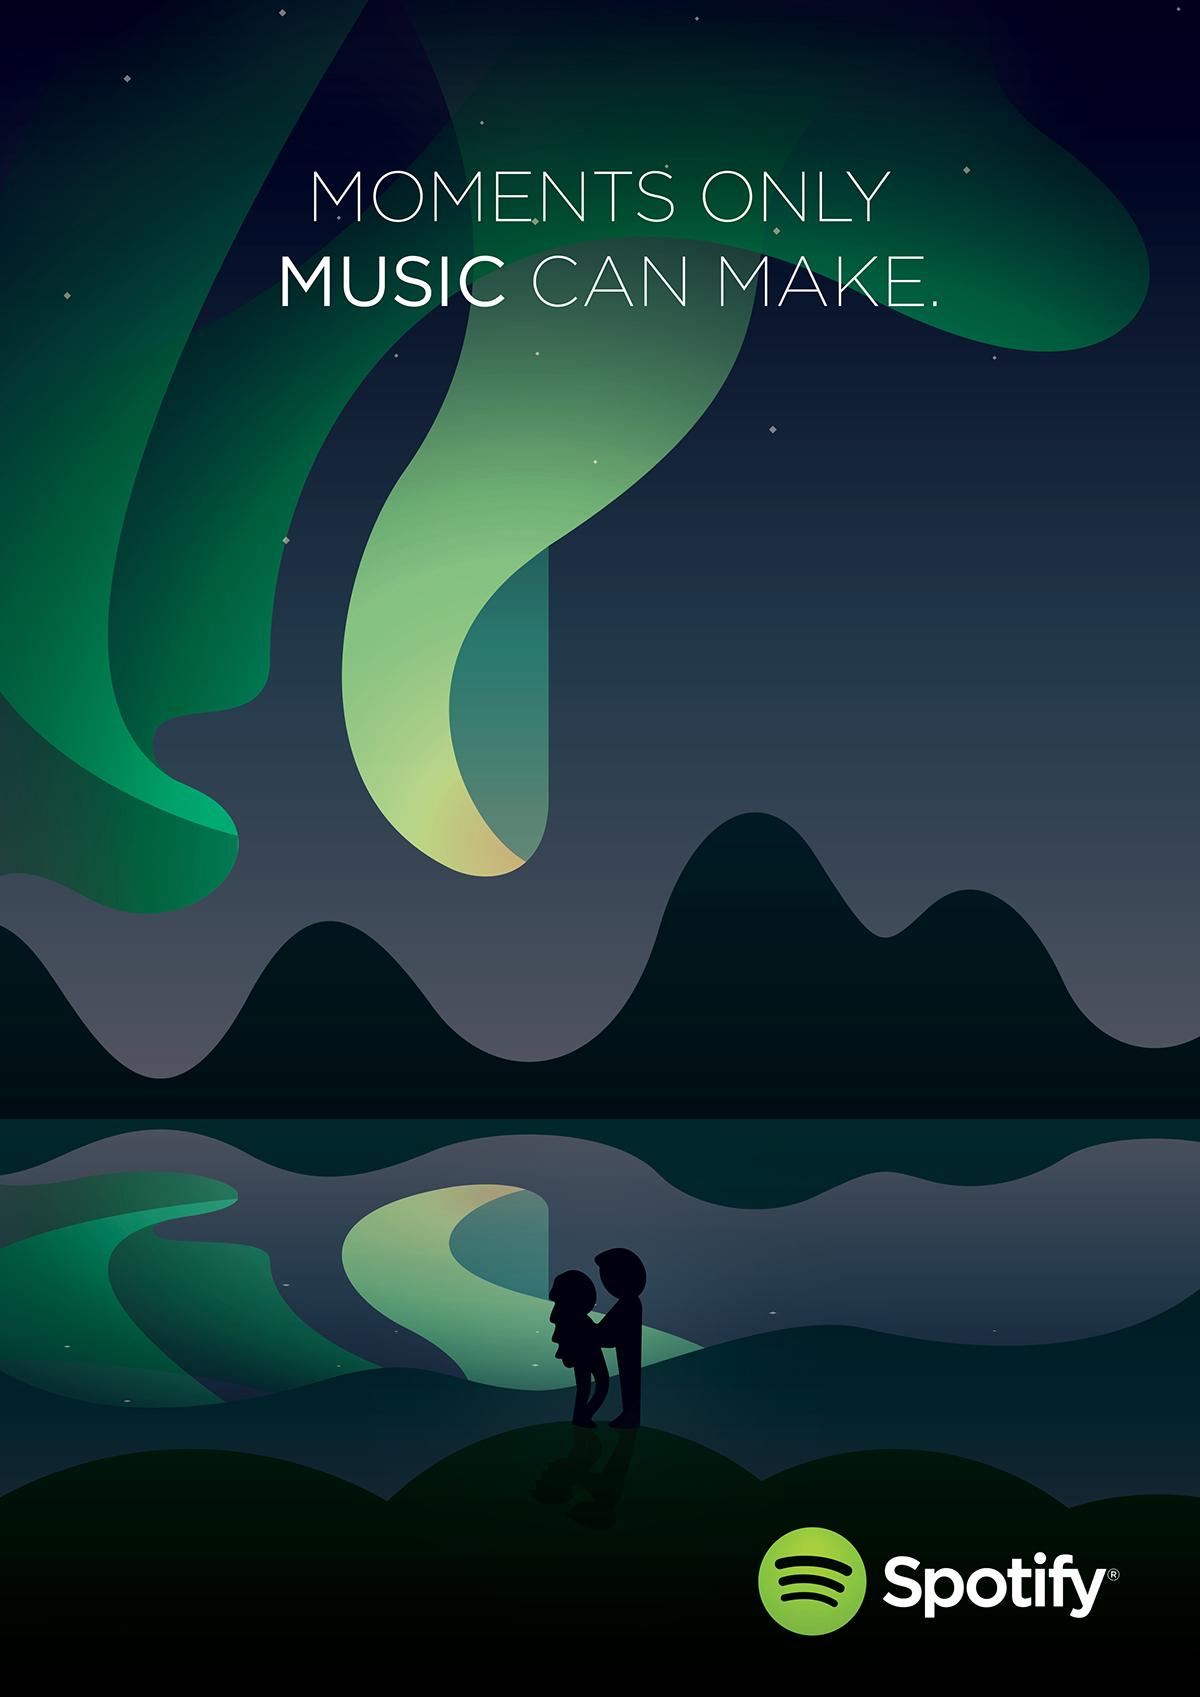 spotify音乐网站平台手绘矢量插画广告海报设计